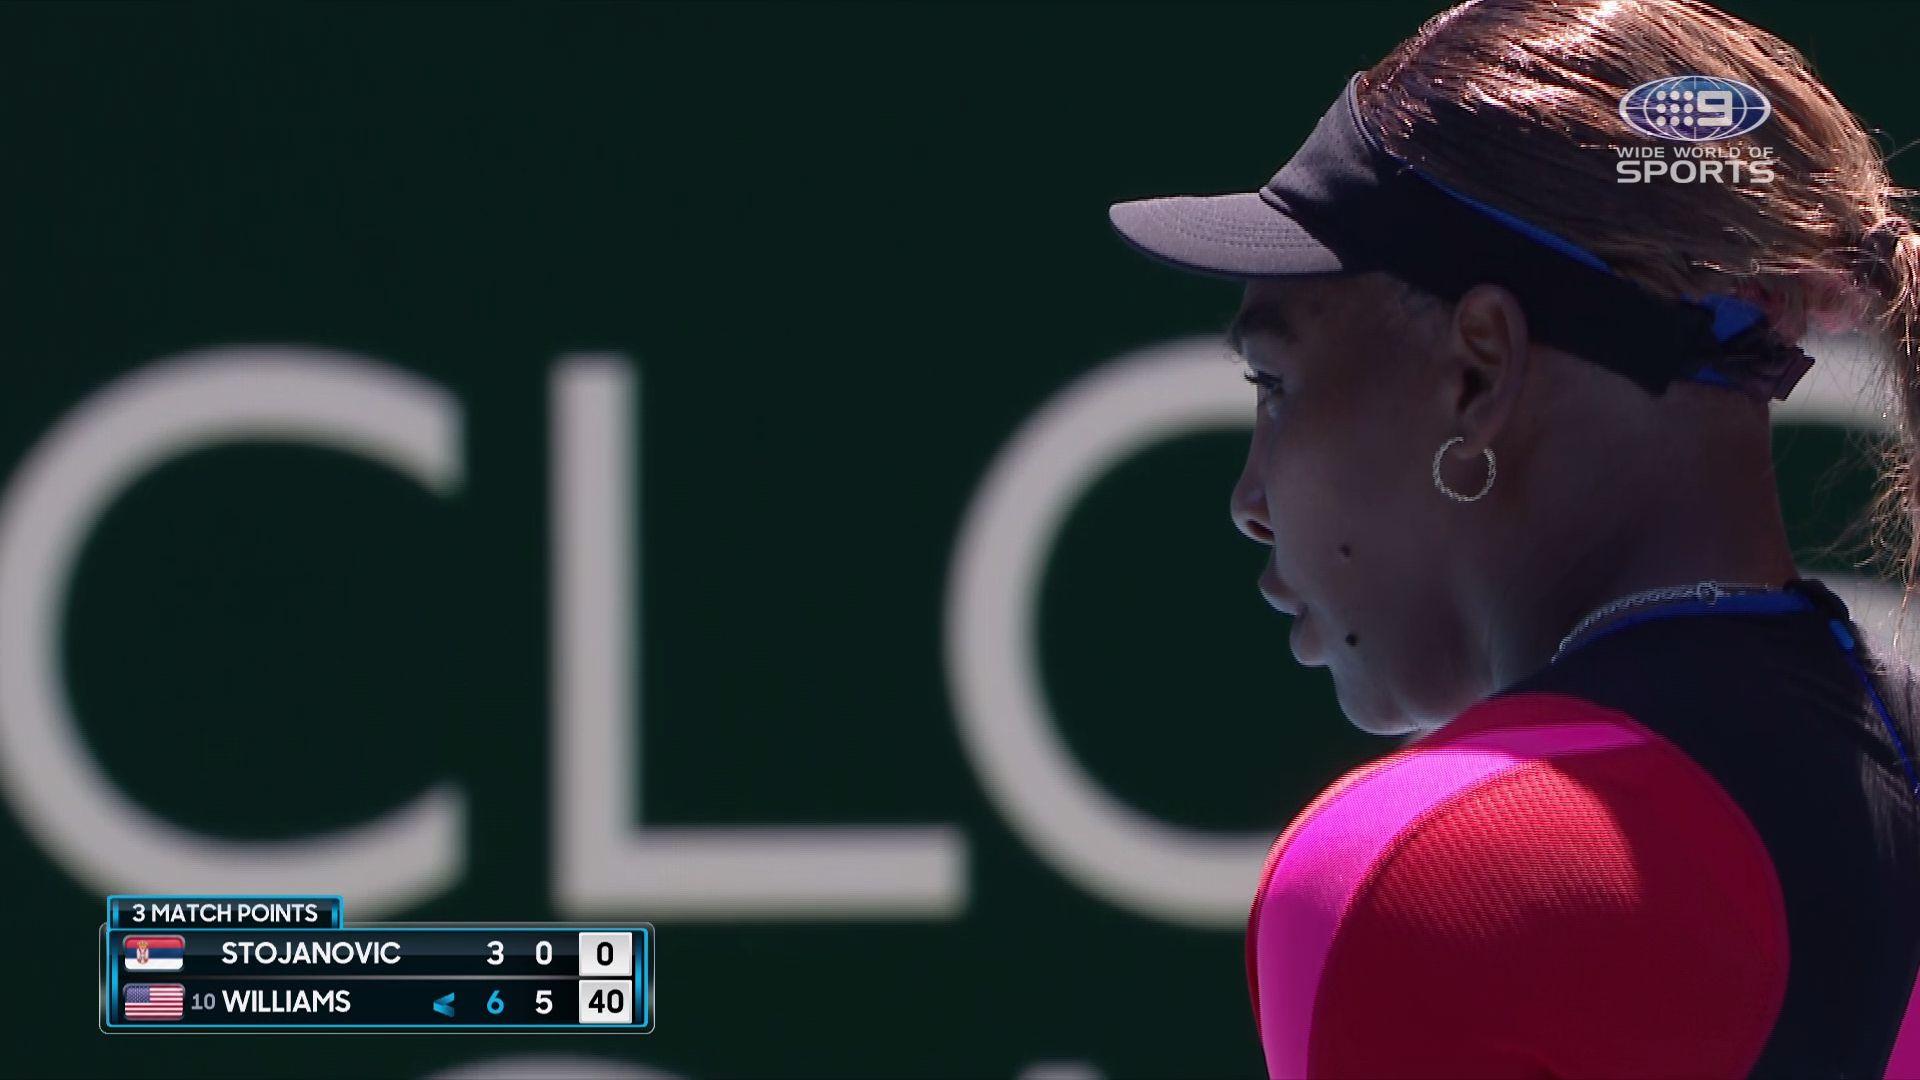 Serena Williams blasts 200km/h serves to fly past Serb Nina Stojanovic